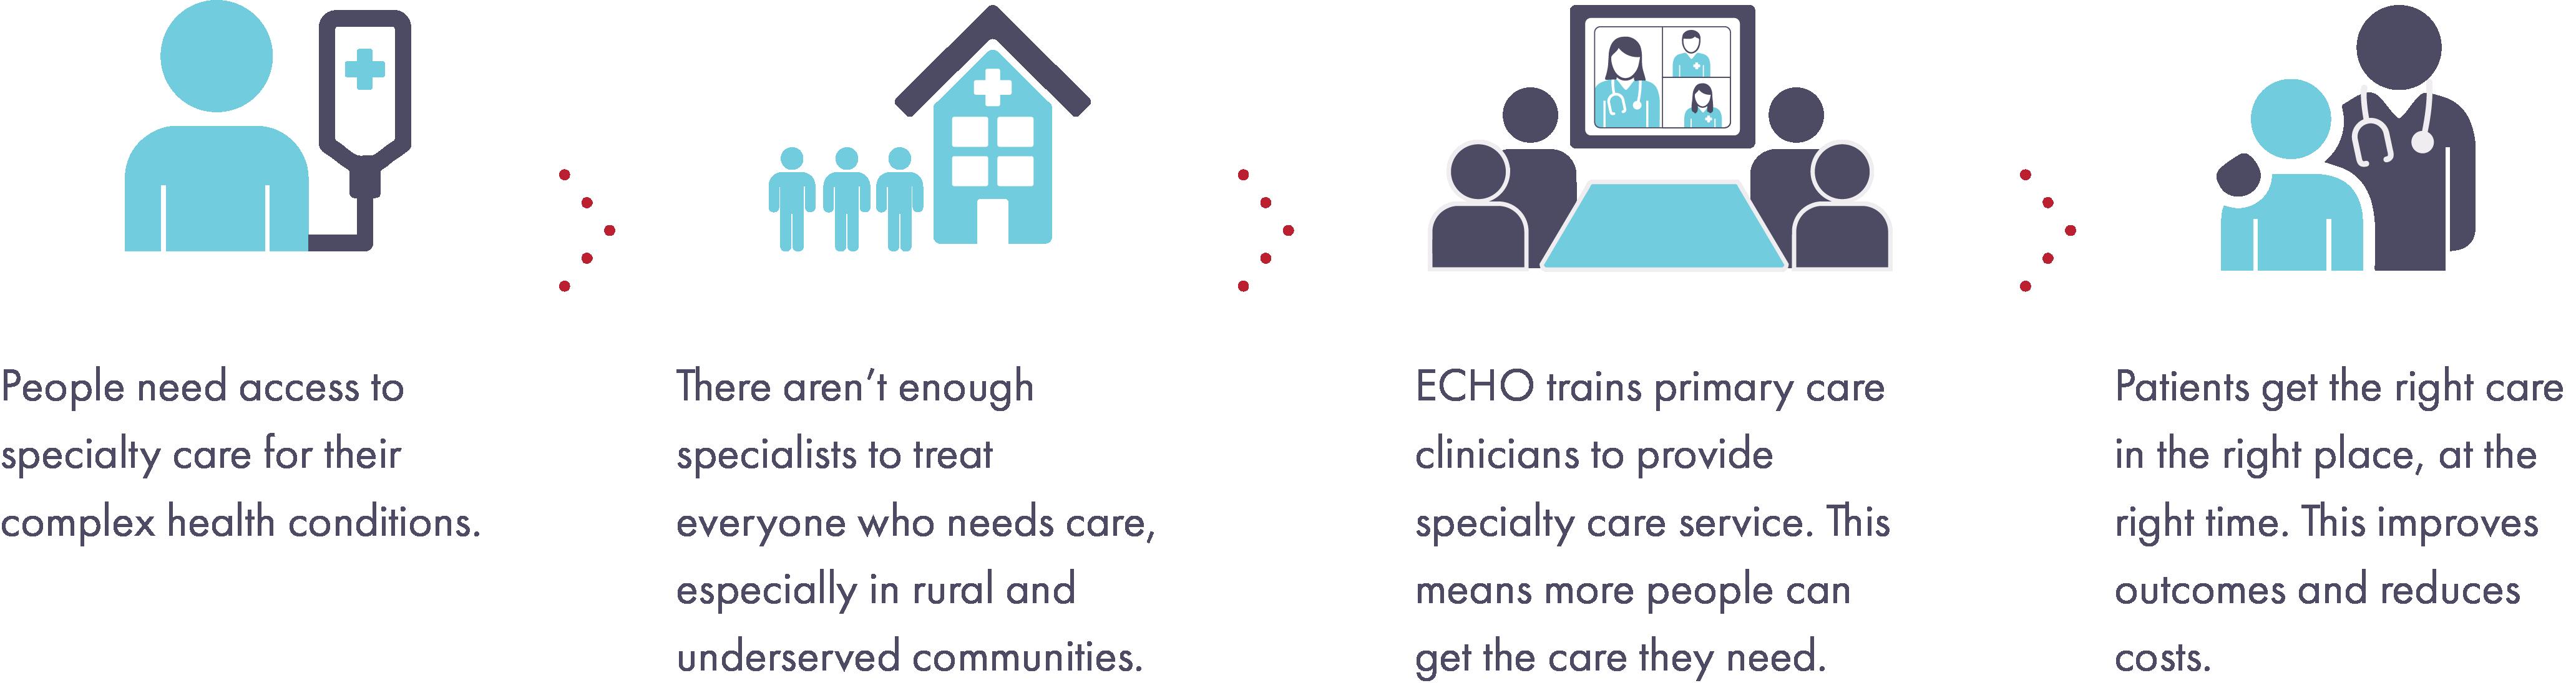 ECHO model illustration